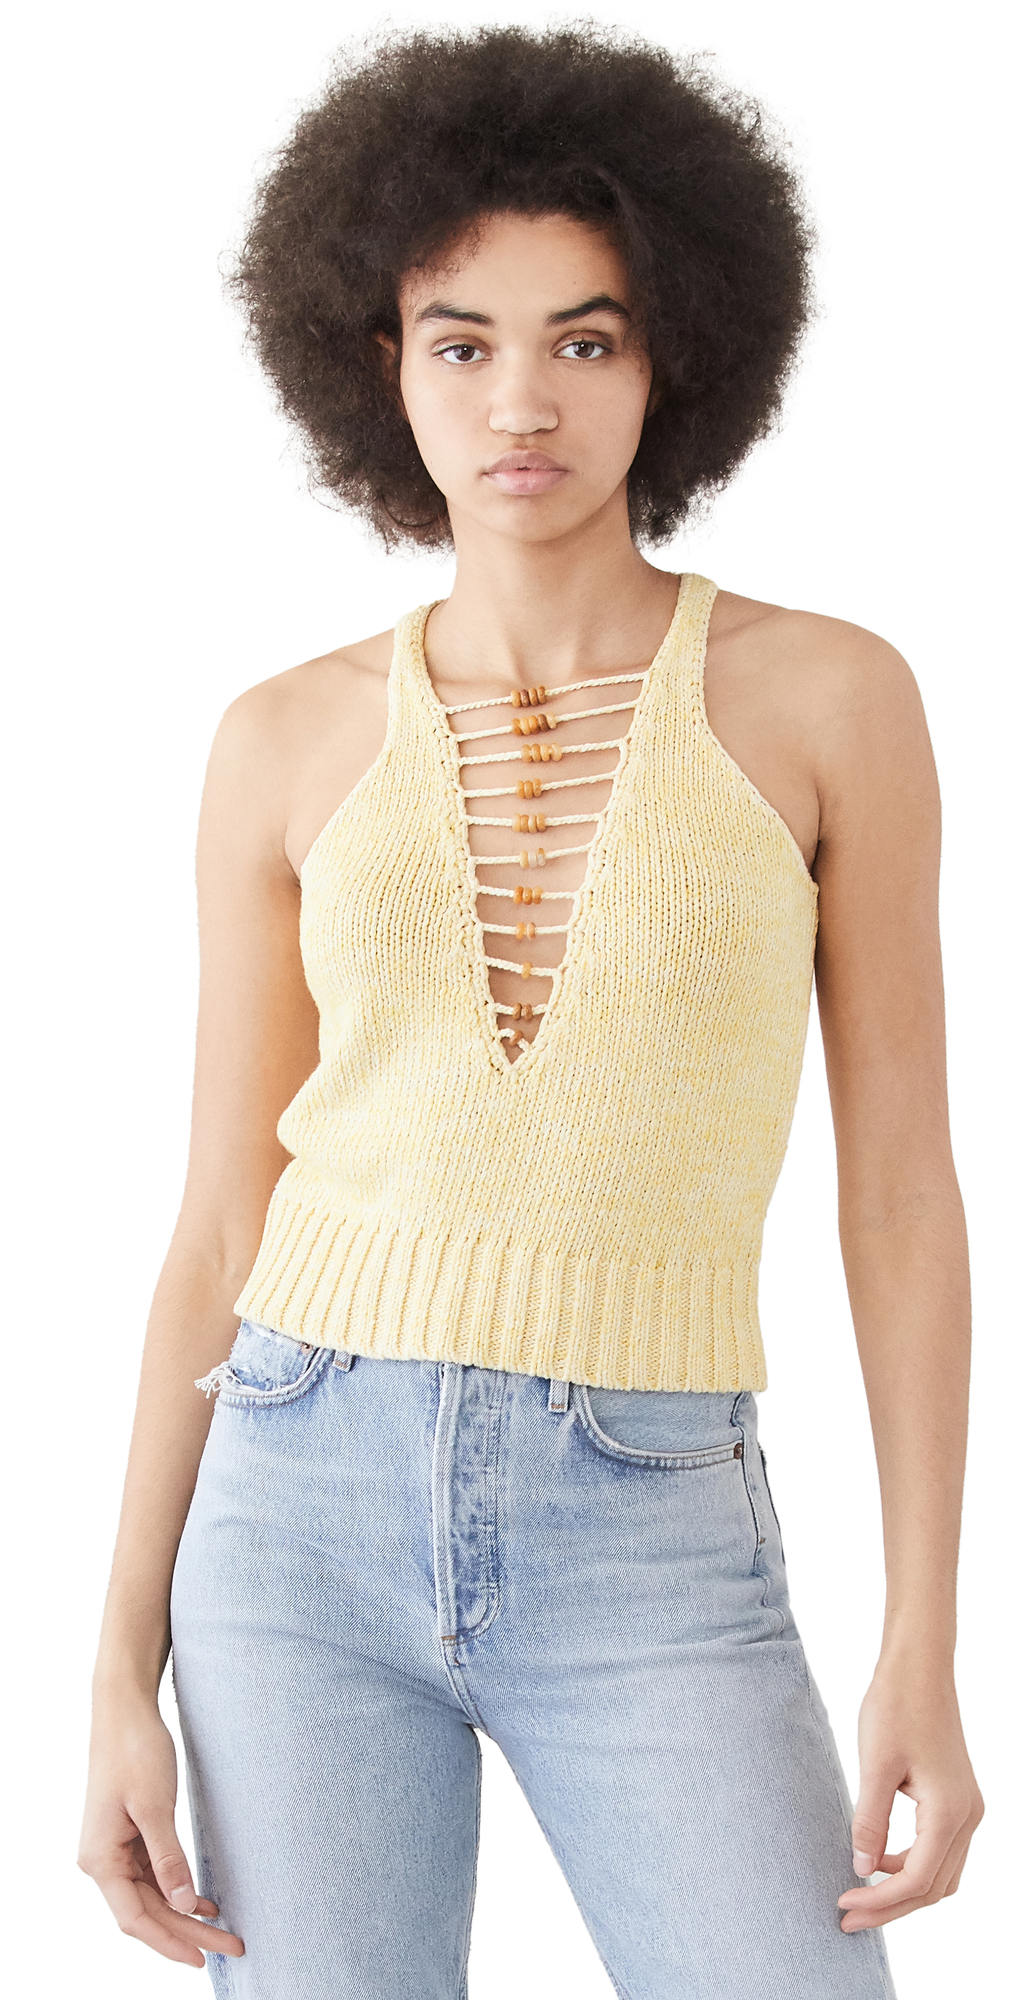 Cotton Crochet Beaded Tank